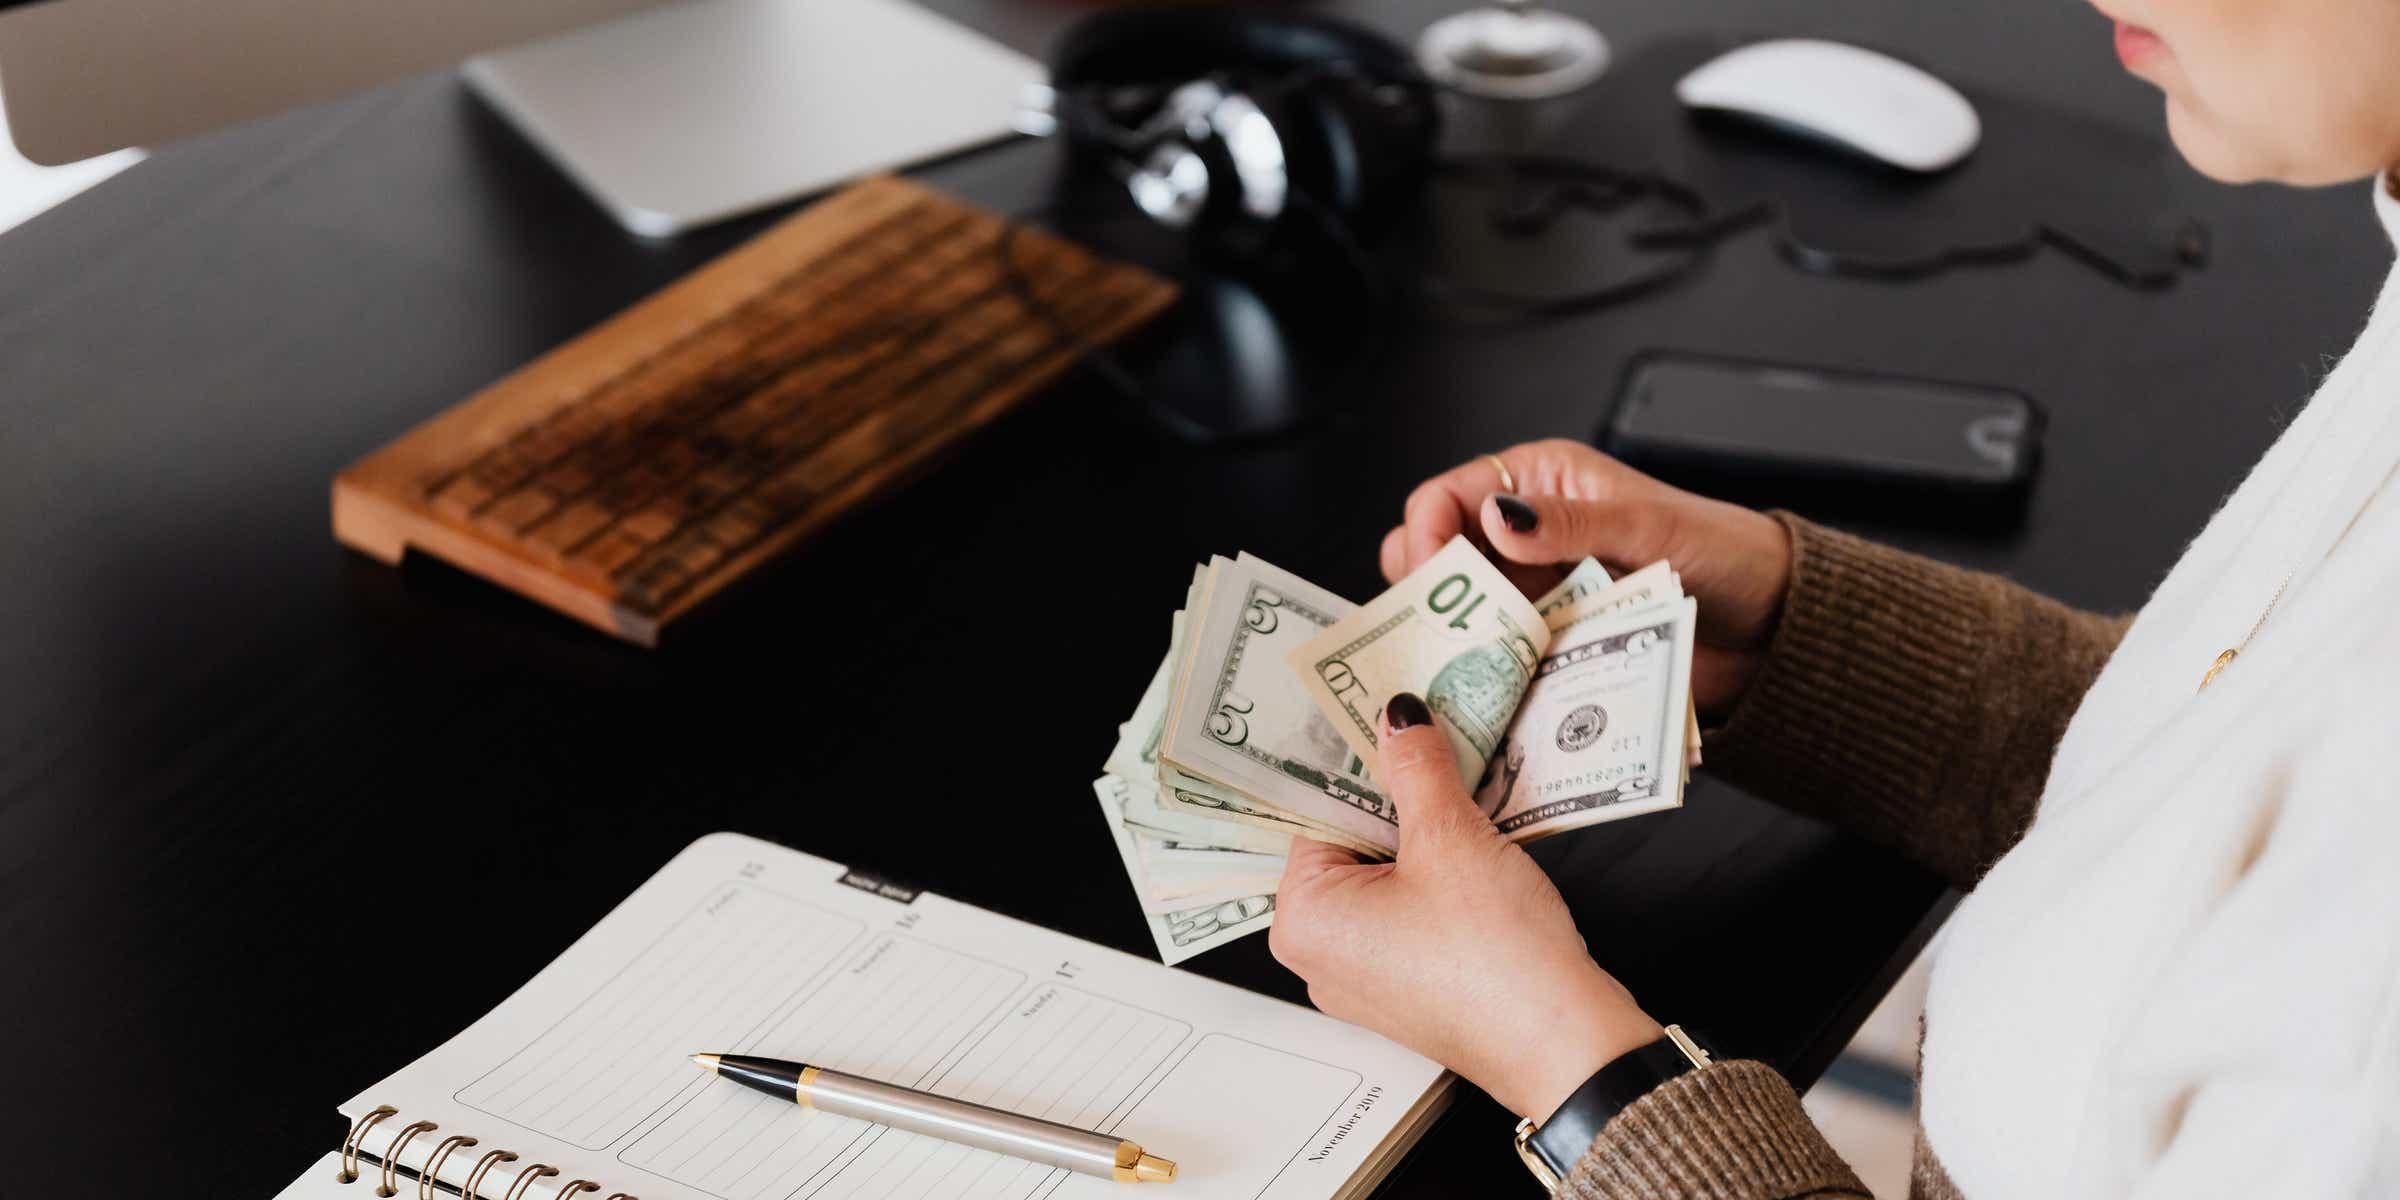 Billing Clerk Interview Questions